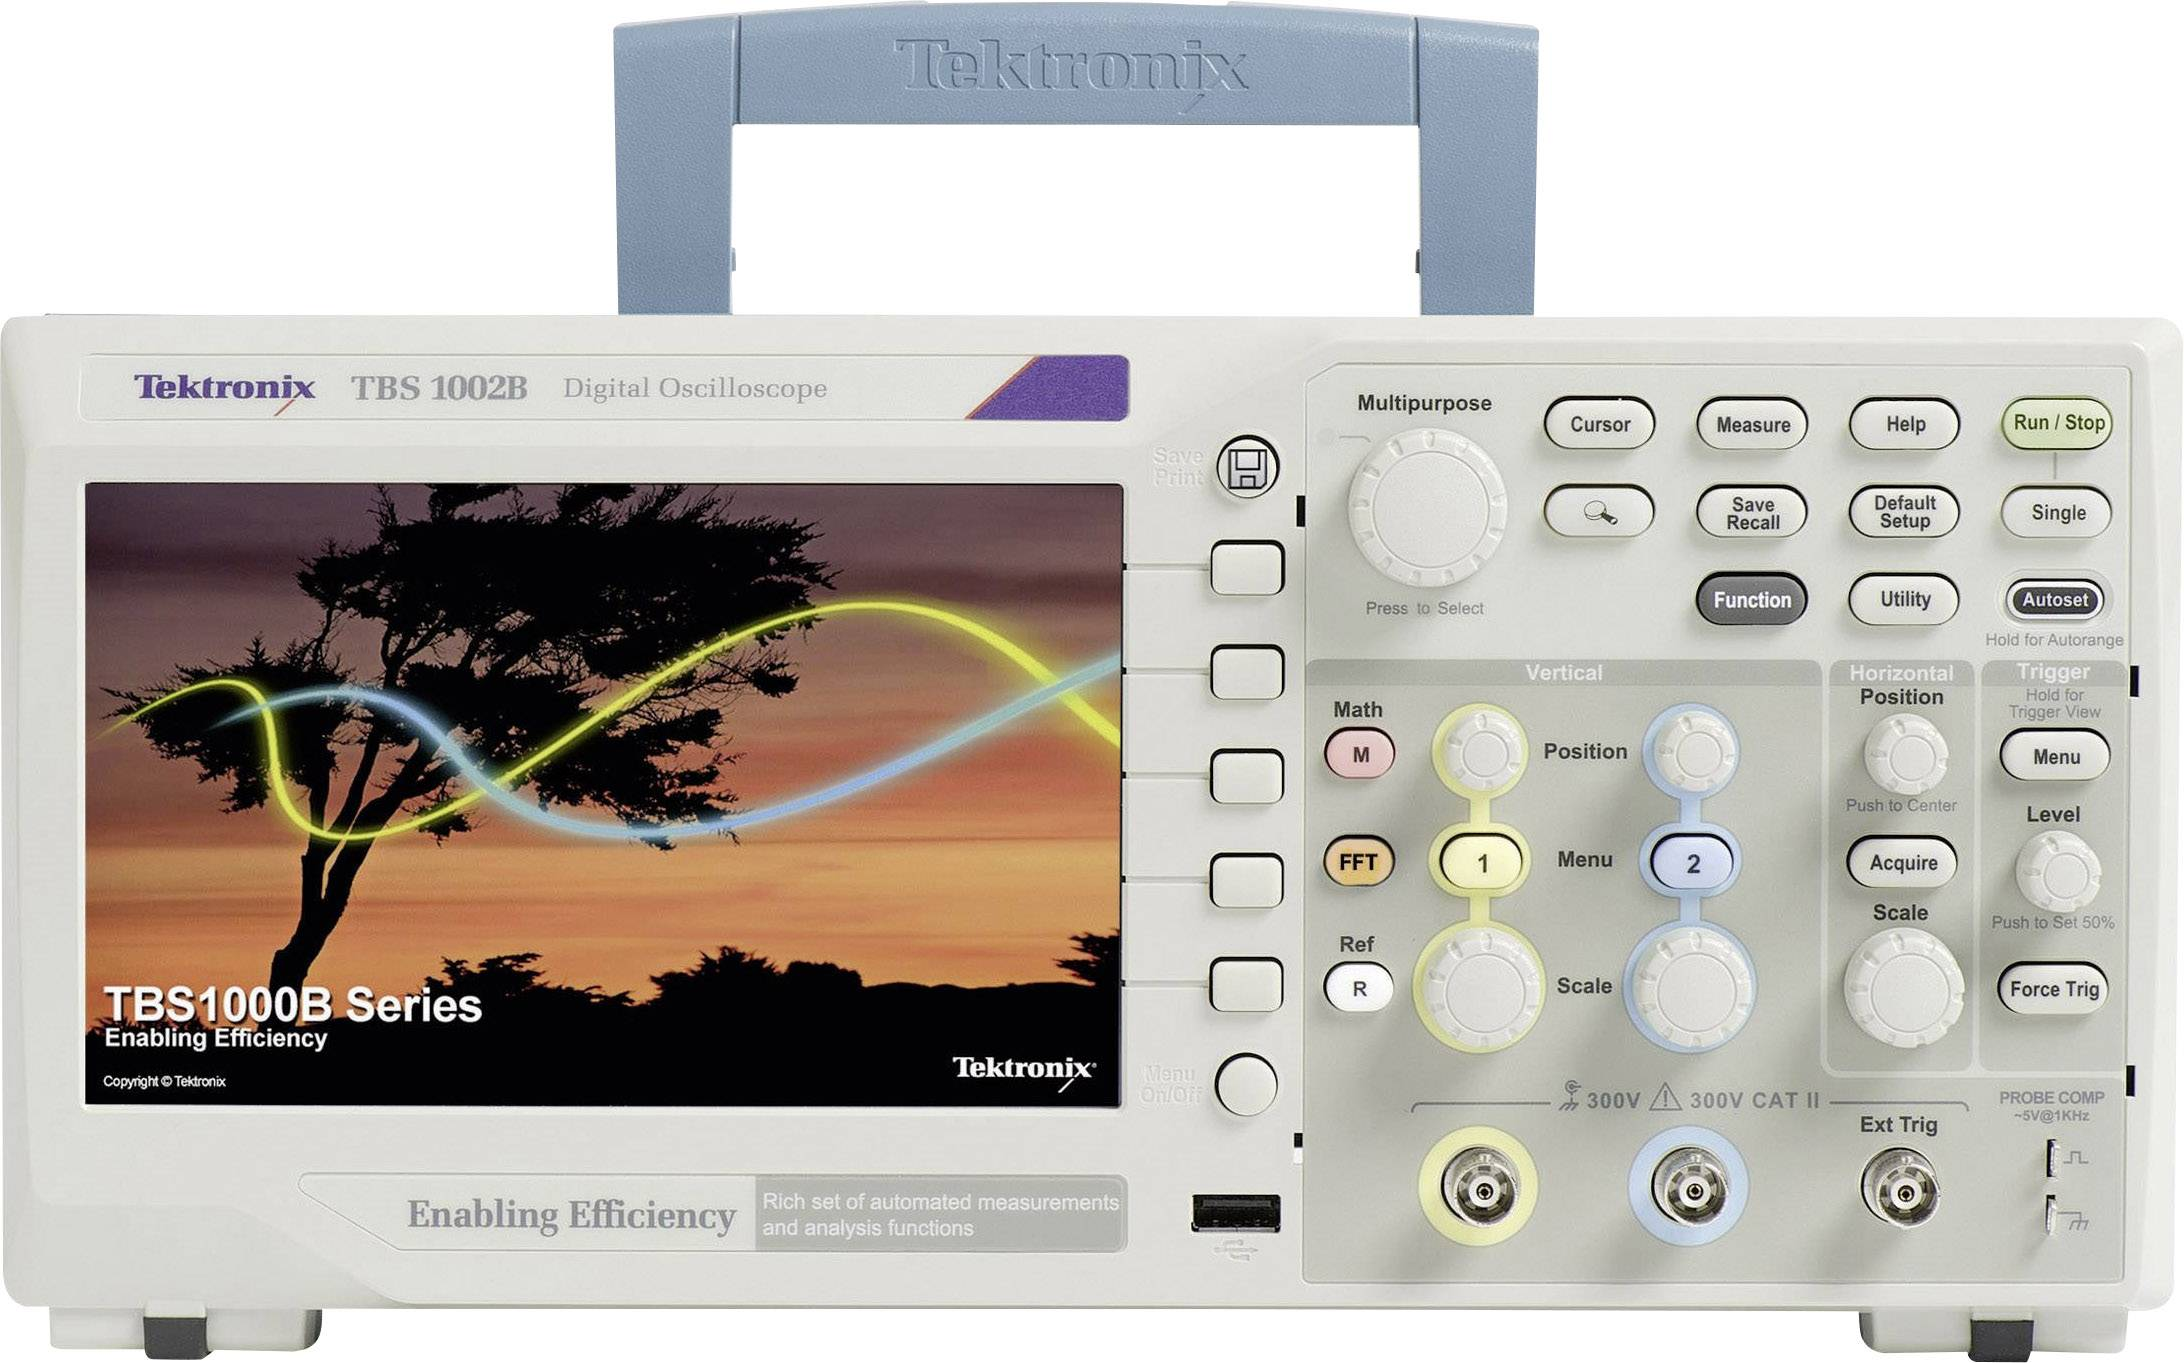 Digitálny osciloskop Tektronix TBS1072B, 70 MHz, 2-kanálový, kalibrácia podľa ISO